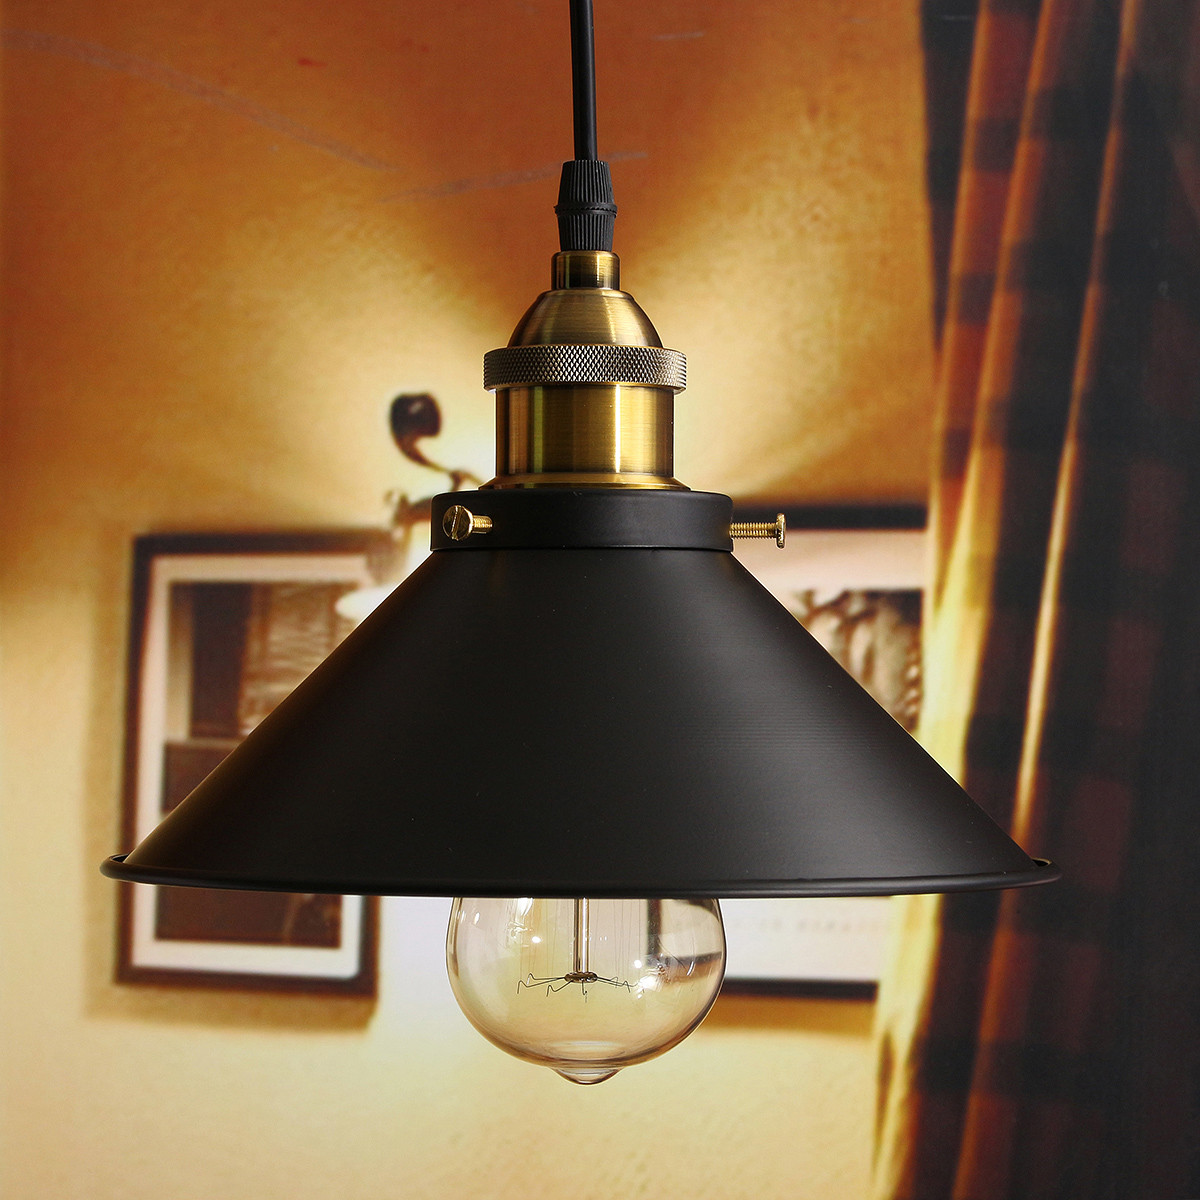 Vintage Industrial Loft Style Ceiling Fixtures Retro Lamp: Loft Vintage Ceiling Lamp Round Retro Ceiling Light